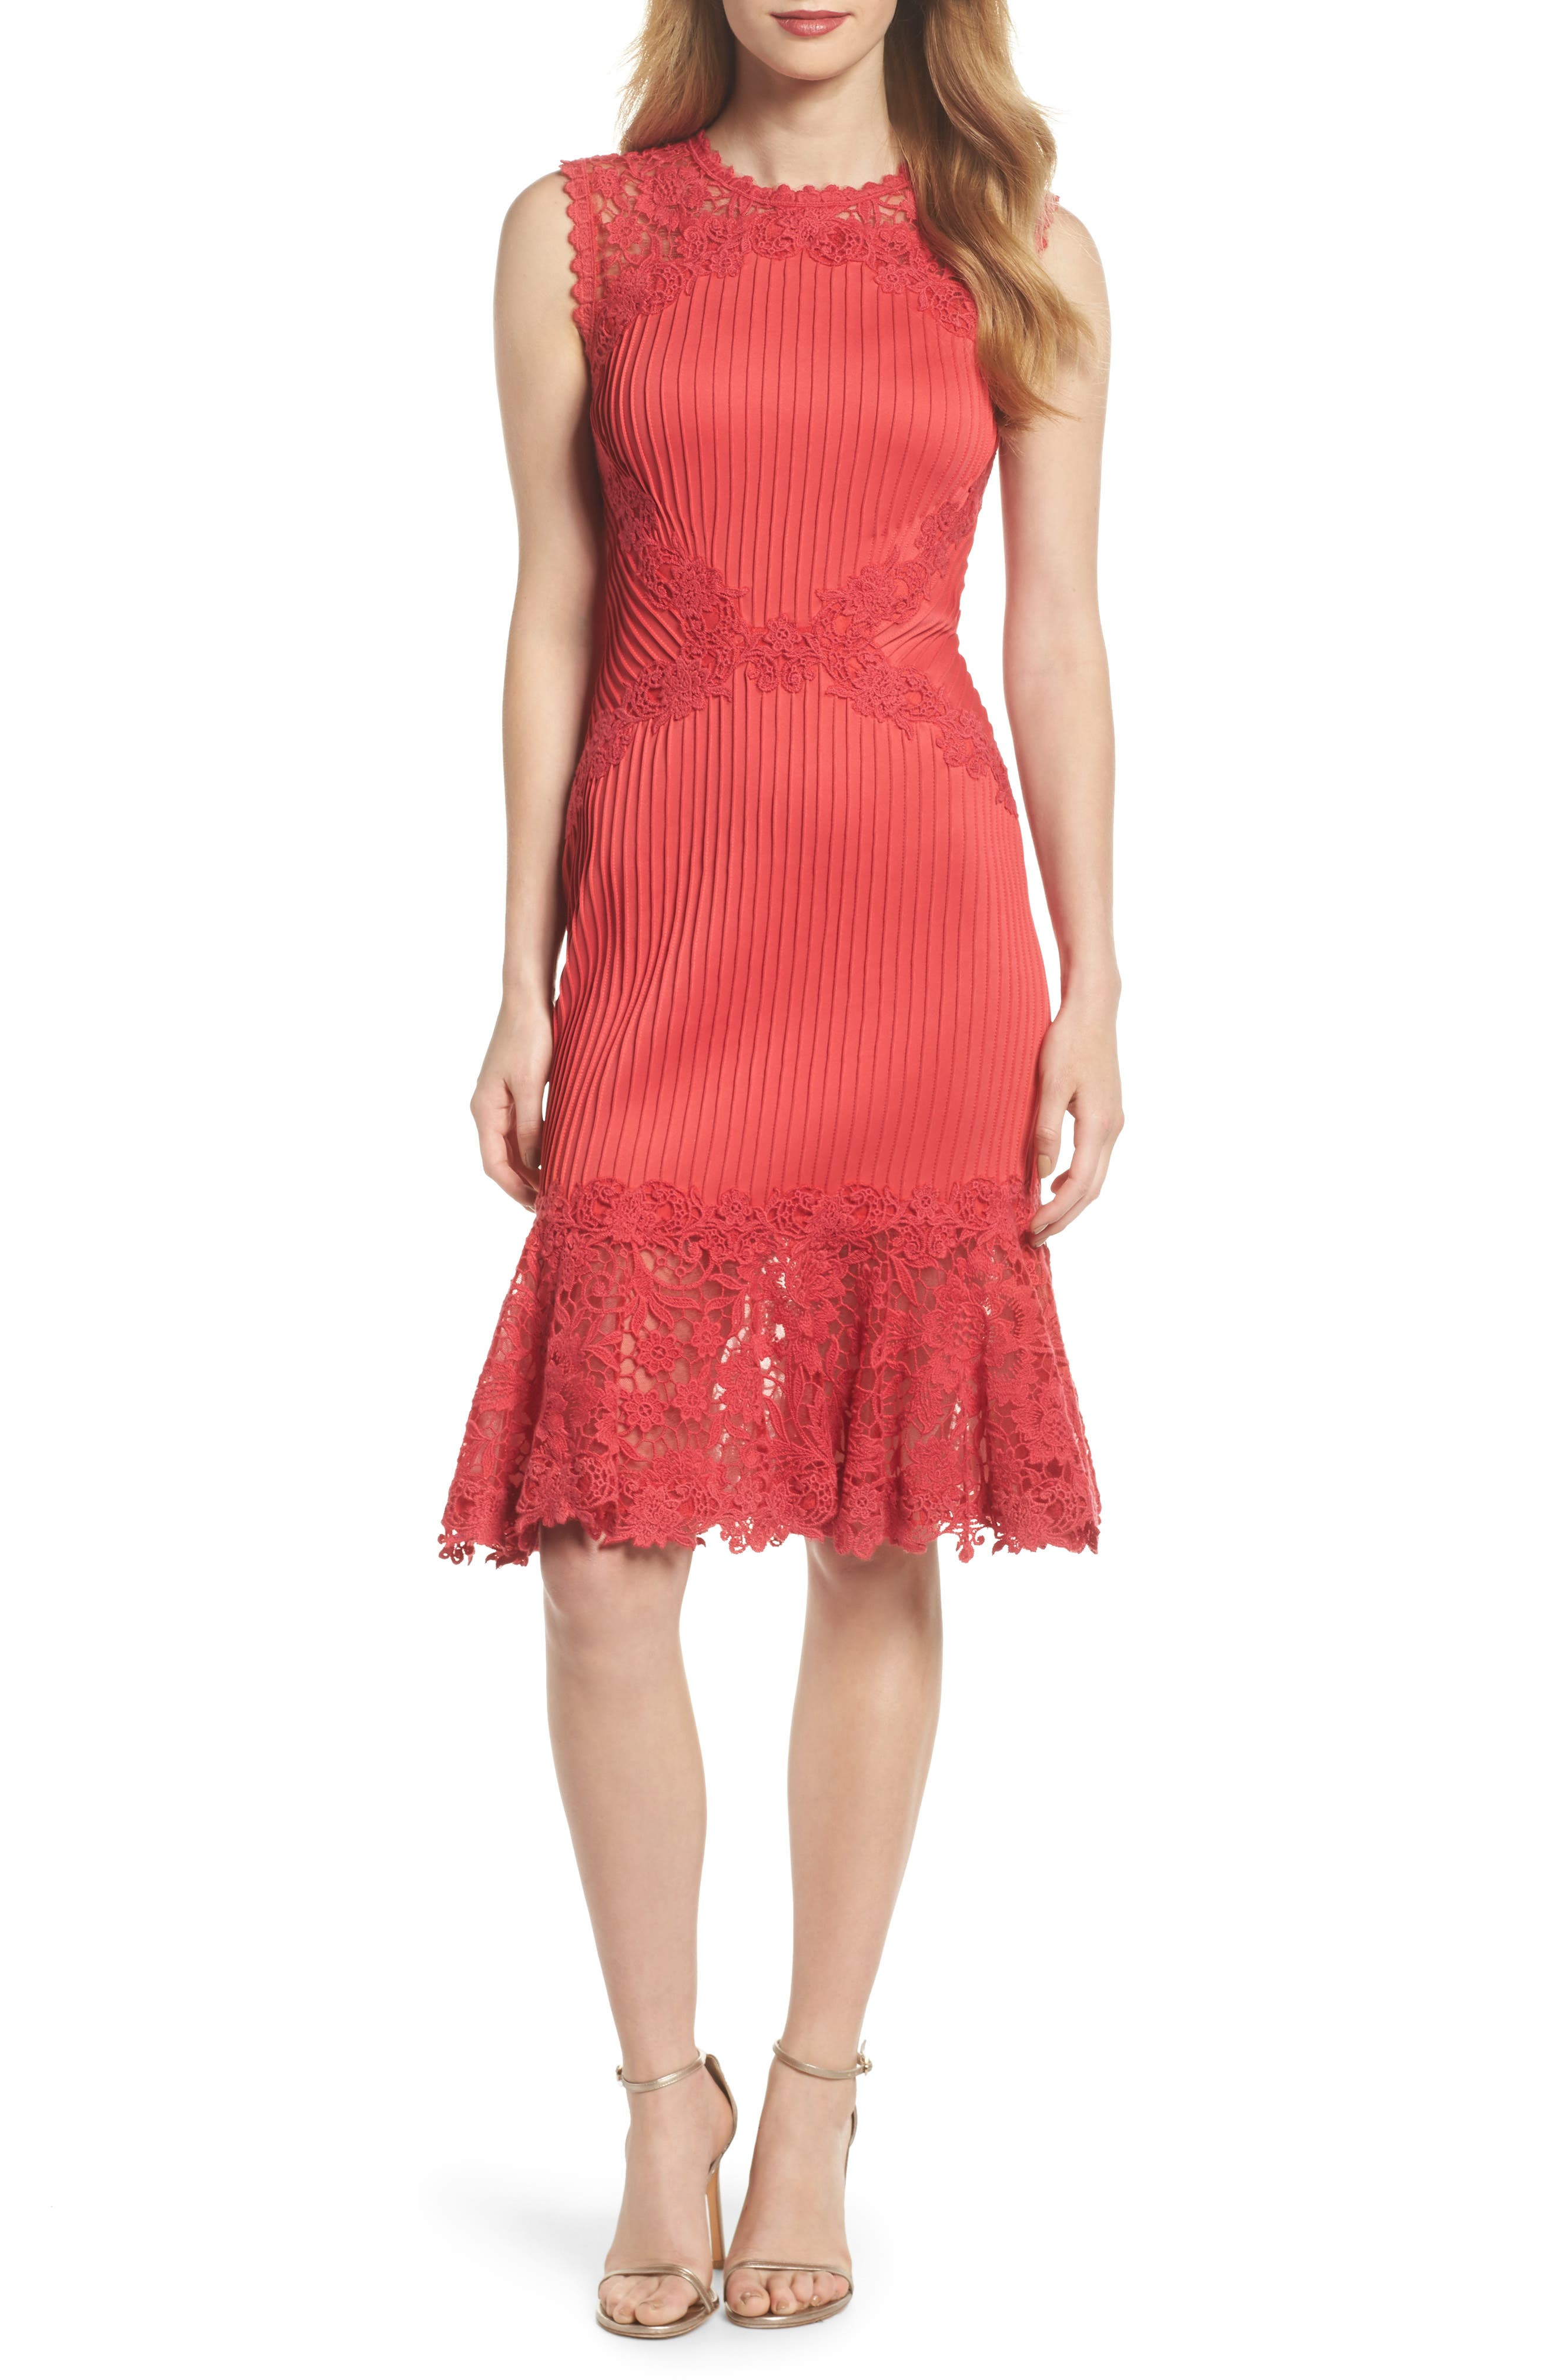 Alternate Image 1 Selected - Tadashi Shoji Crochet Trim Pintucked Sheath Dress